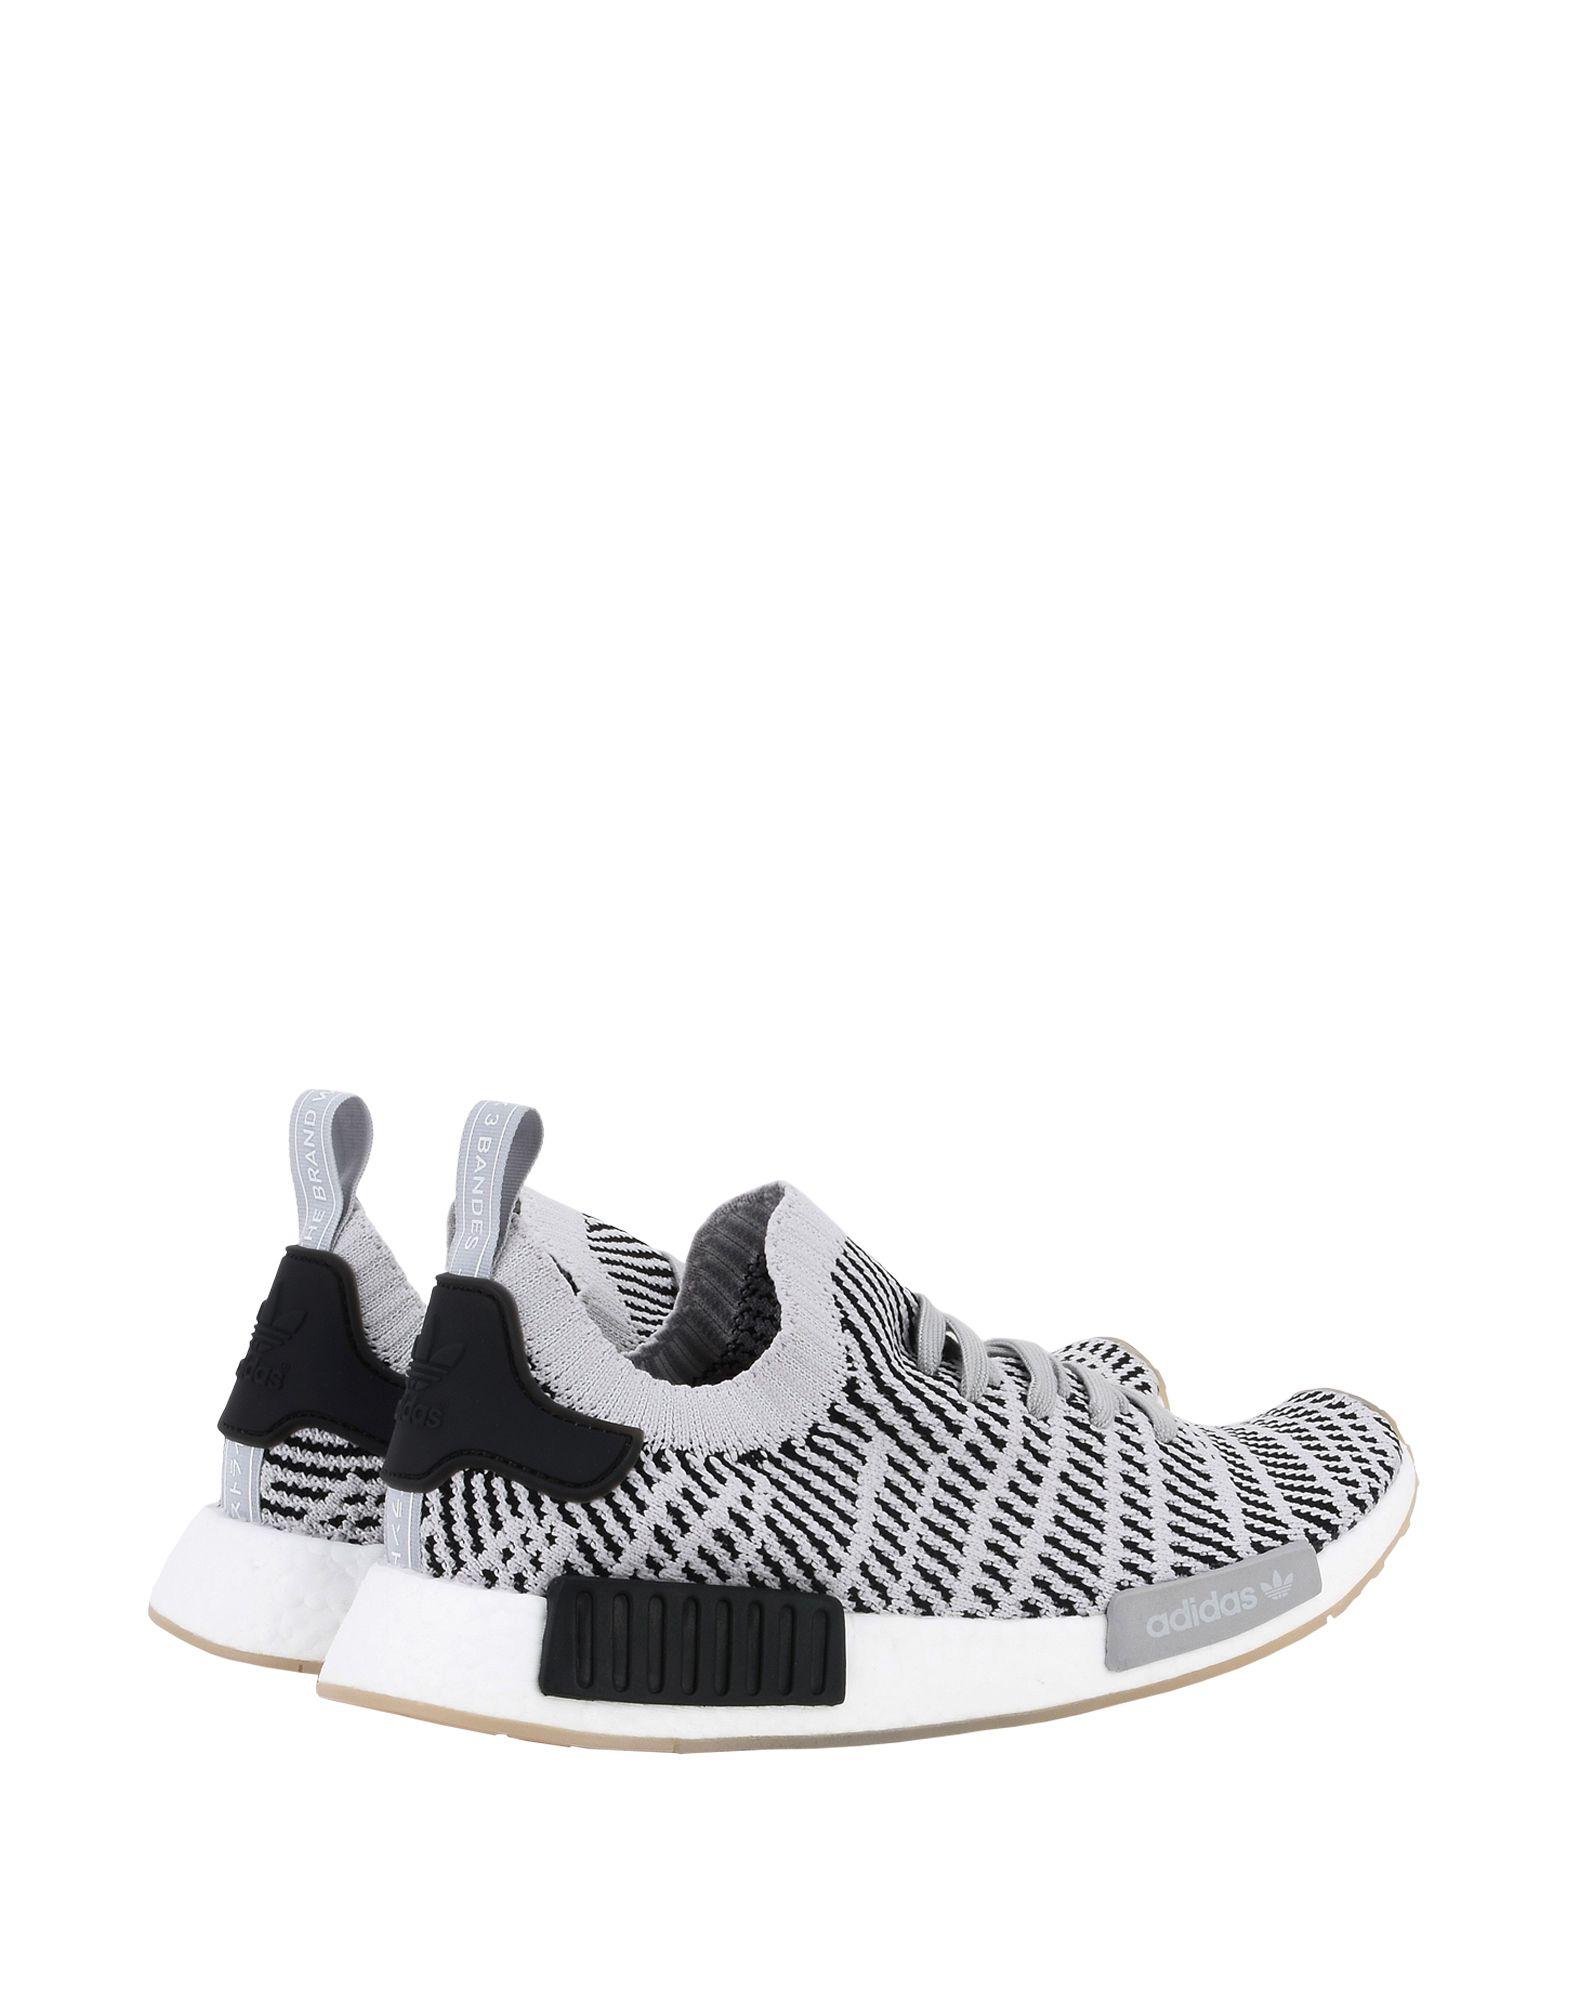 Sneakers Adidas Originals Nmd_R1 Stlt Pk - Uomo - 11432133TW